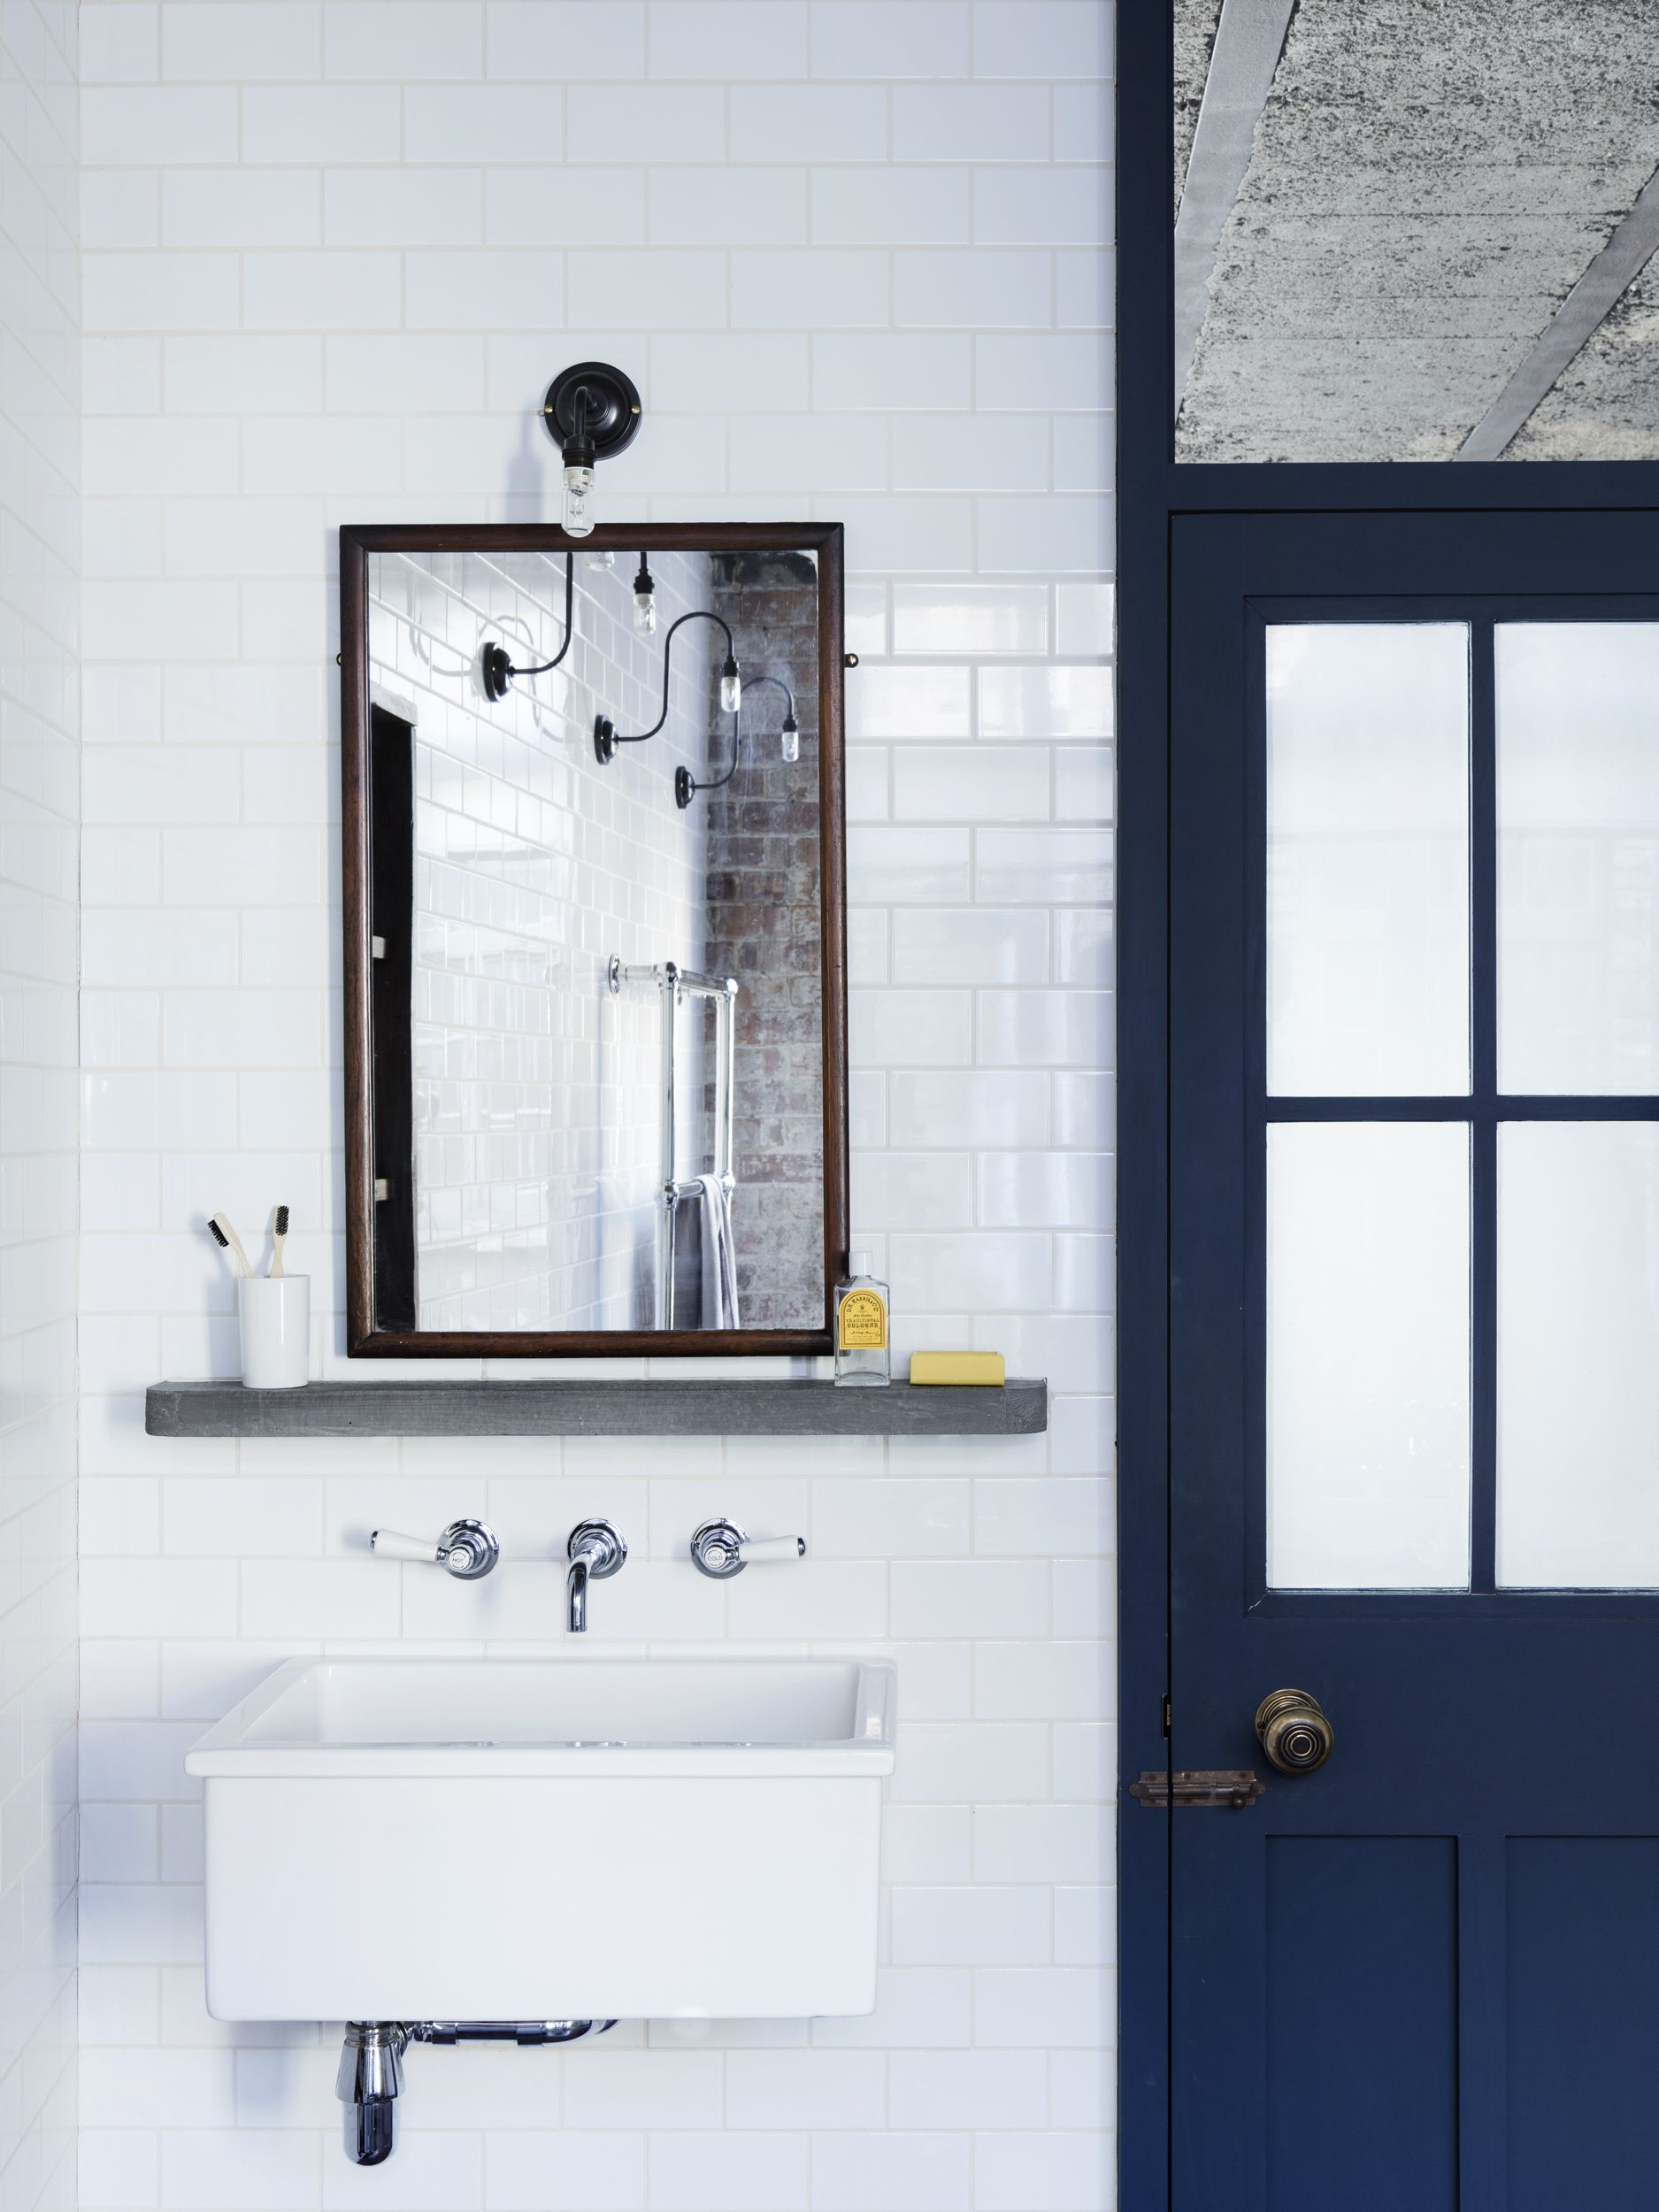 A cast concrete shelf sits below a vintage mahogany framed mirror - Hoxton  Square Renovation Project